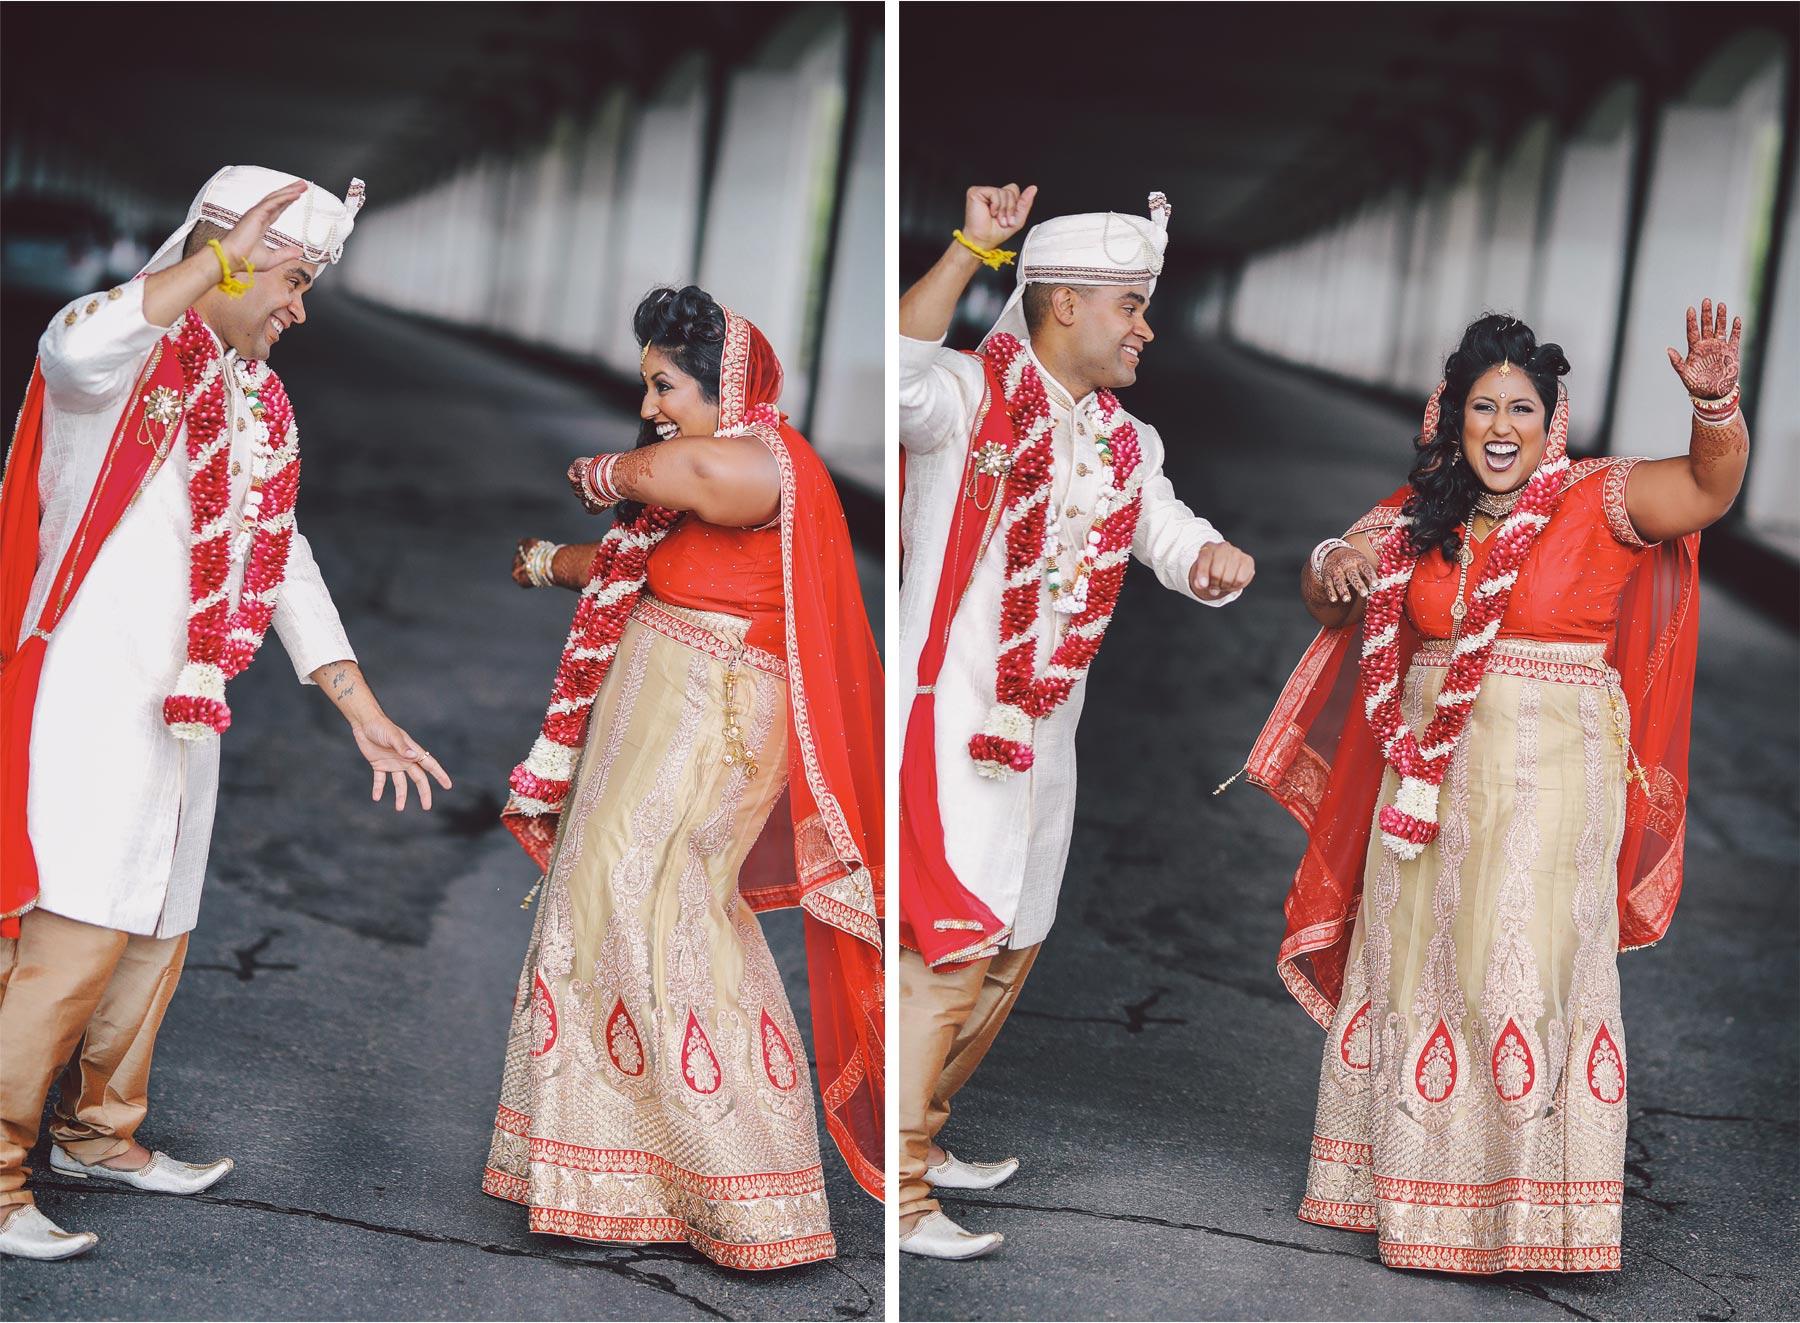 18-St-Paul-Minnesota-Wedding-Photography-by-Vick-Photography-Happy-Bride-and-Groom-Dancing-Leena-and-Michael.jpg